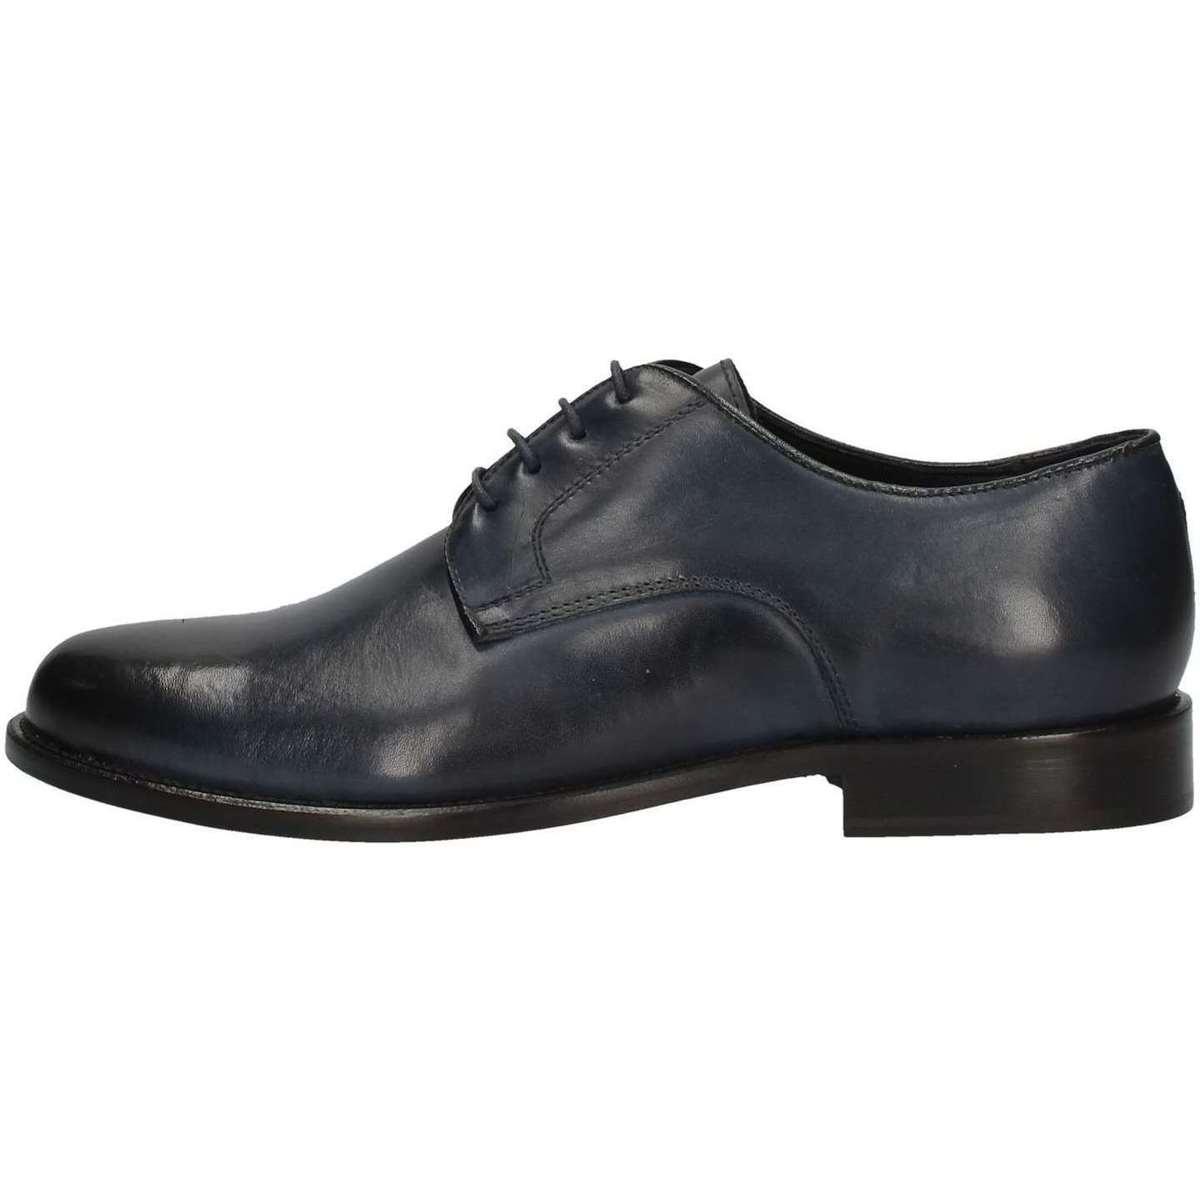 Hudson 901 Lace up shoes Mann Blau Blau - Schuhe Derby-Schuhe Herren 114,00 €